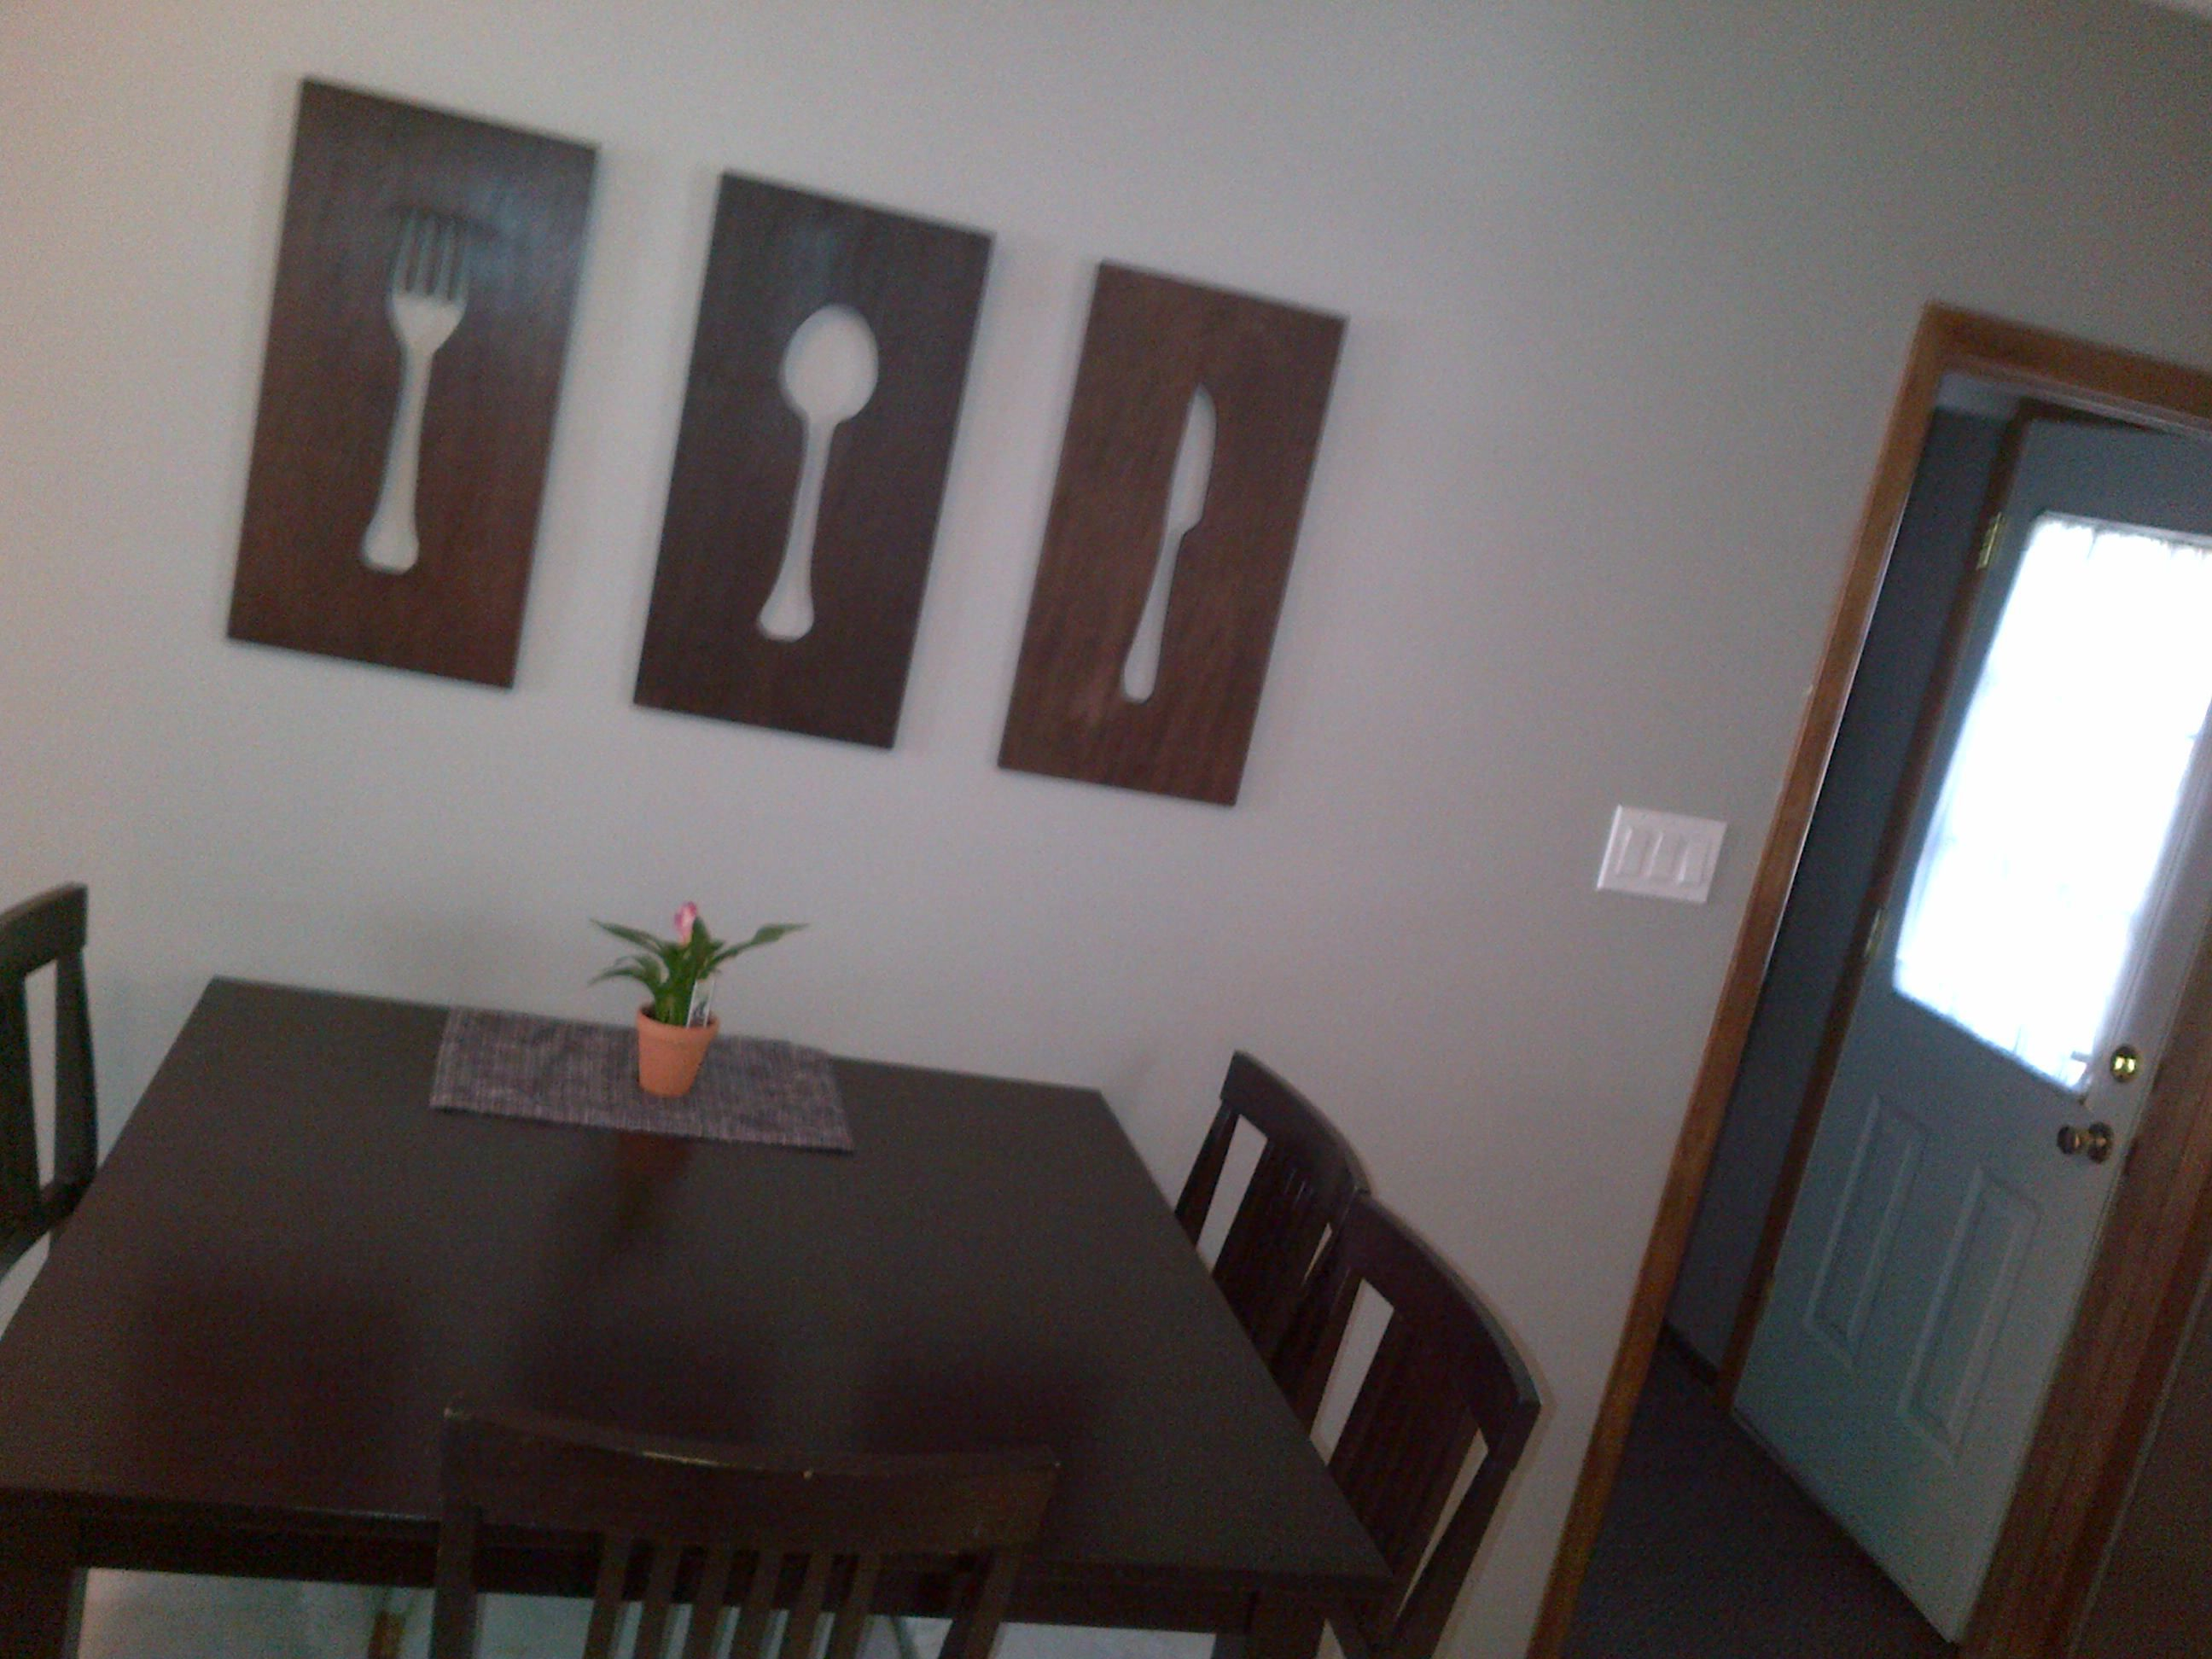 Fork Spoon Knife Wall Decor Diy Decor Wall Decor Decor